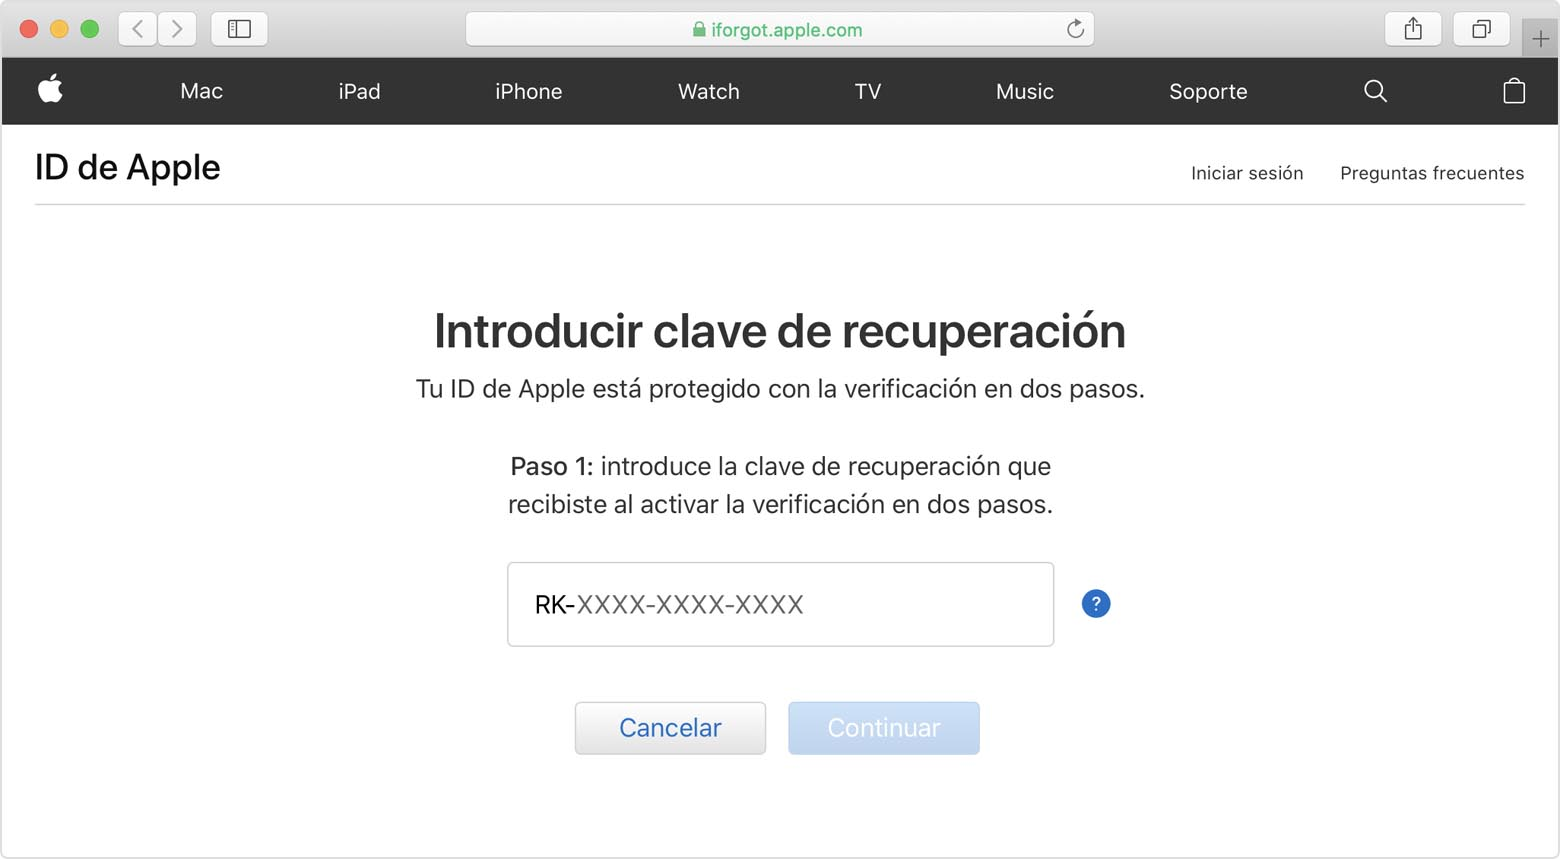 Pantalla ID de Apple mostrando Introducir clave de recuperación